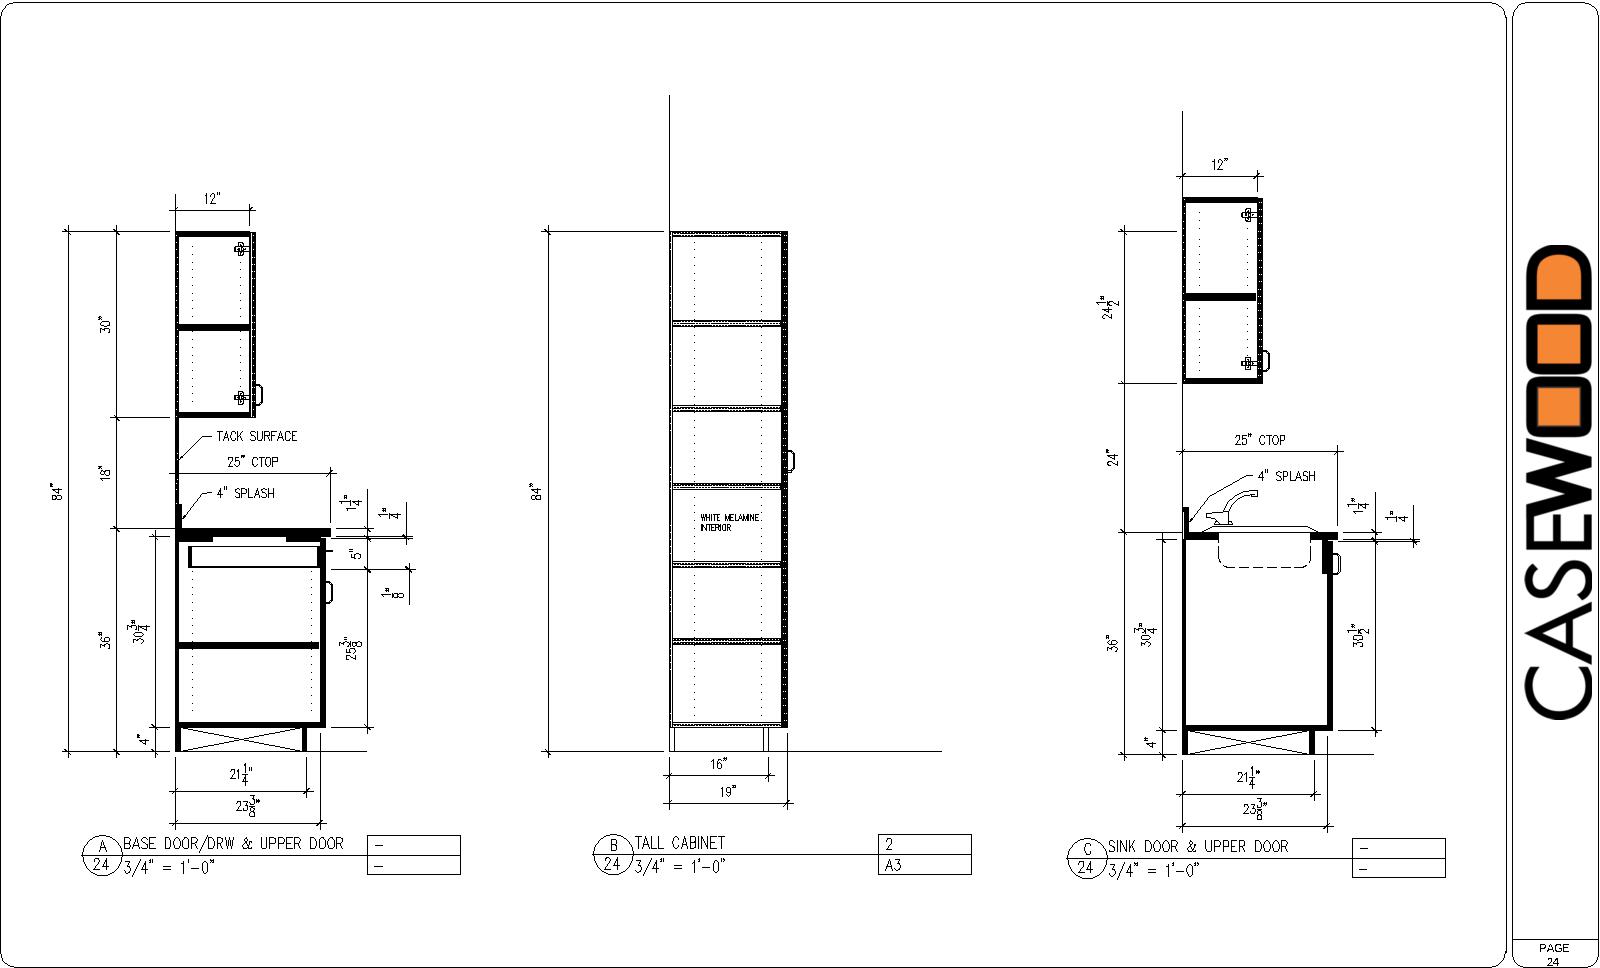 sample cad drawings casewood � cabinet shop drawings